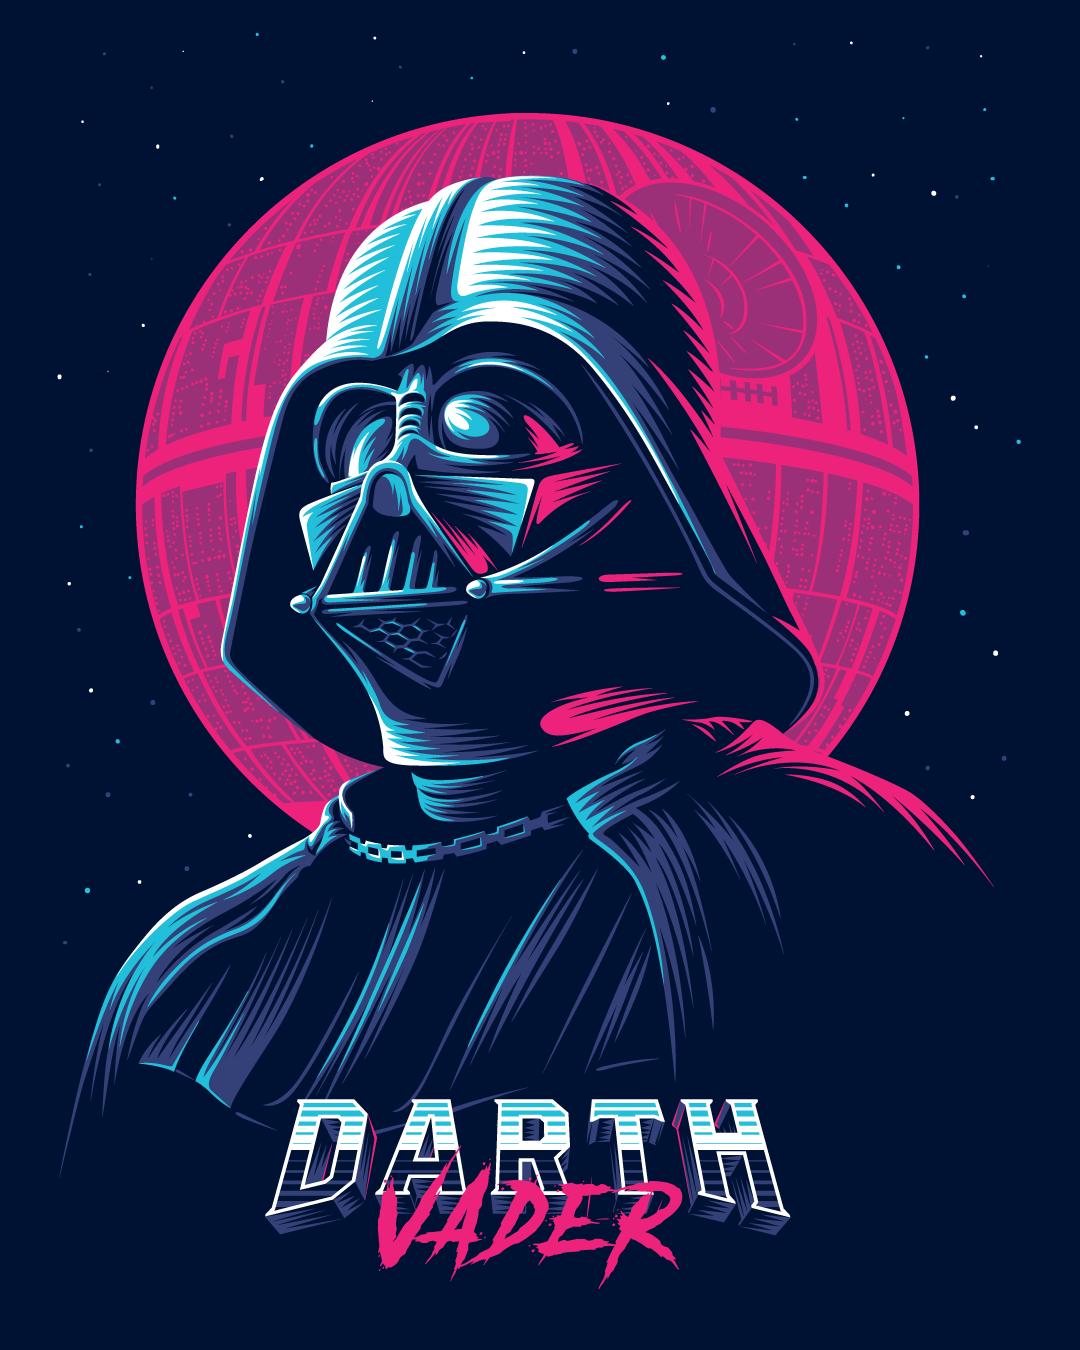 darth vader posterspy star wars